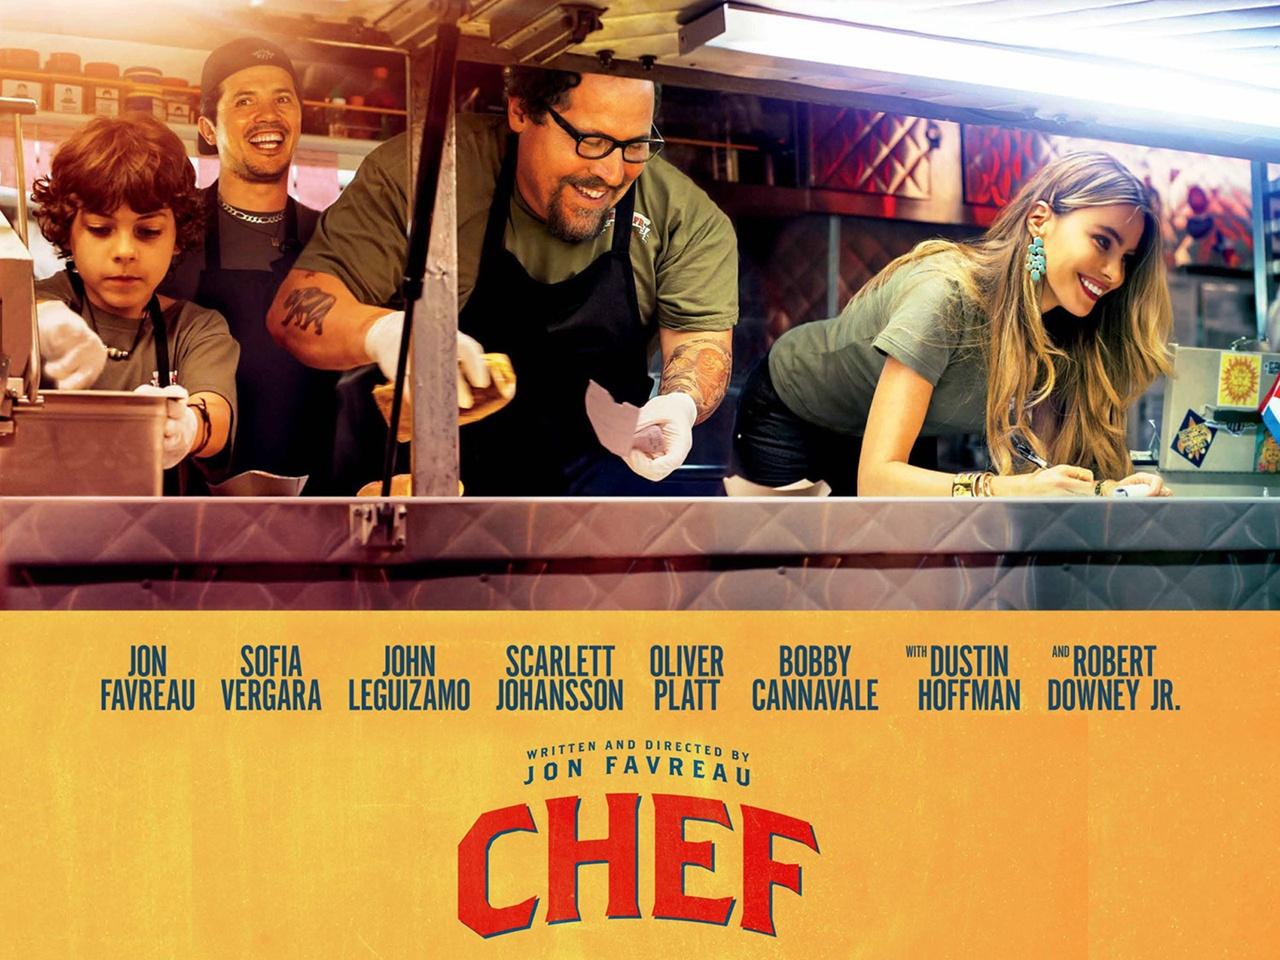 Chef movie picture transparent Weekend Rundown: 4 Film Reviews - Nerdlocker.com picture transparent